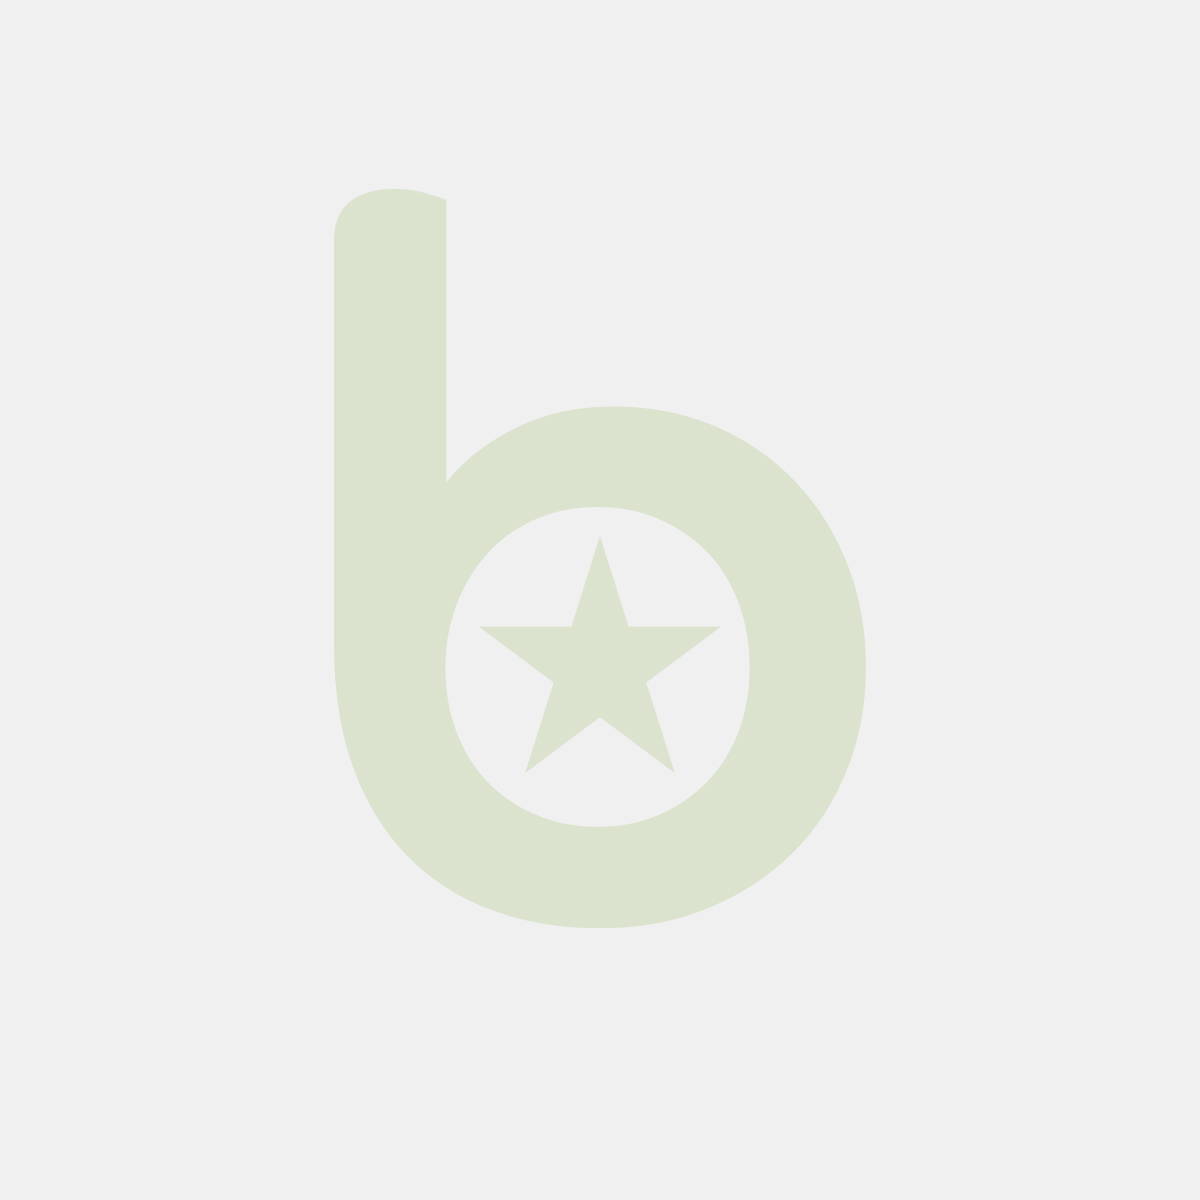 Sznurek polipropylenowy tex 1400 (2kg)